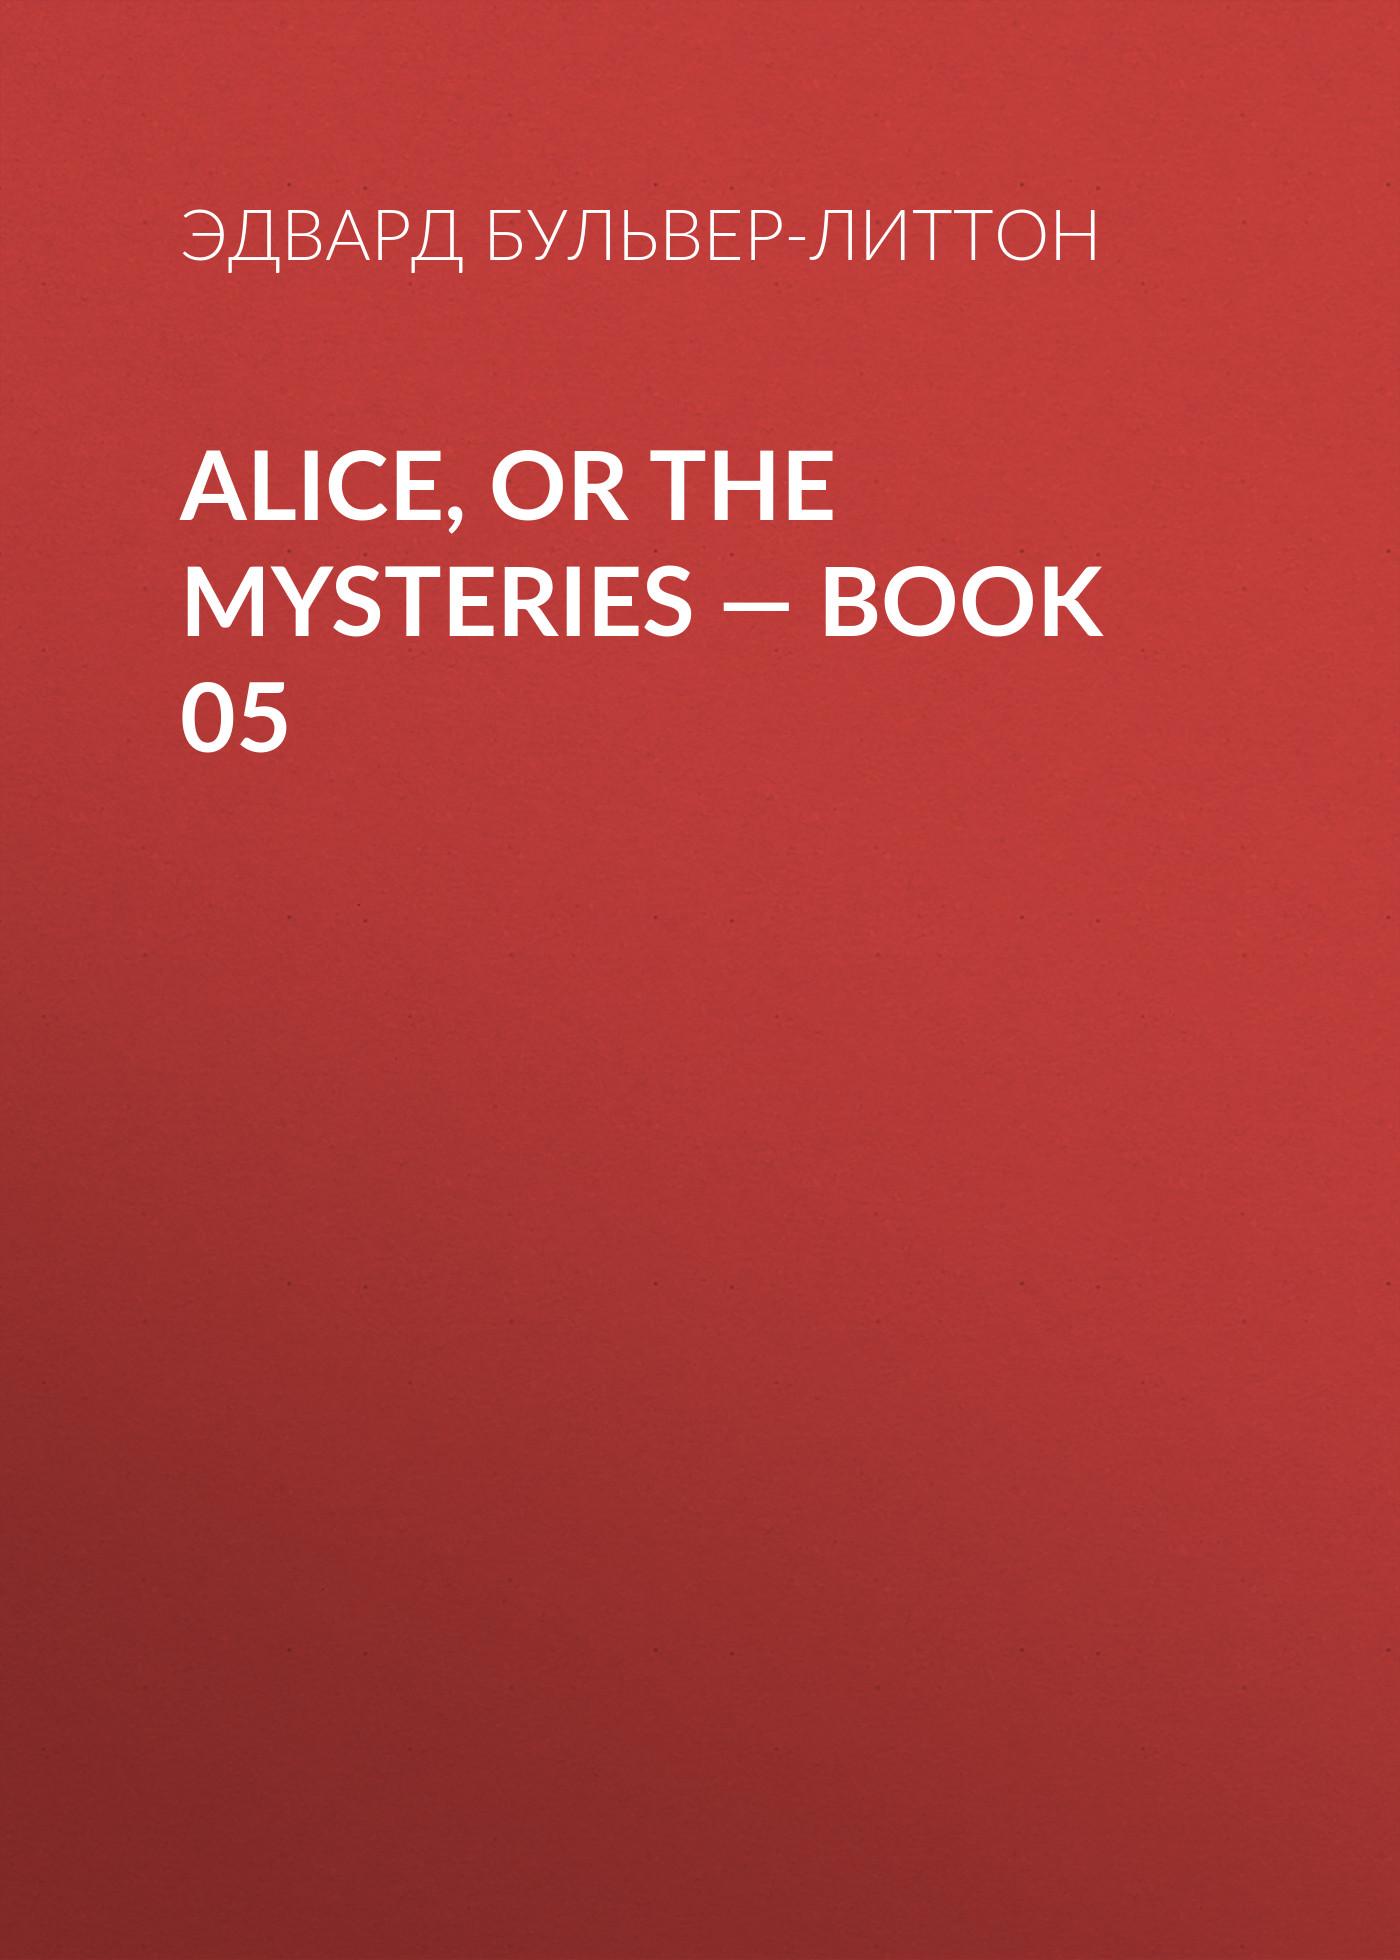 Alice, or the Mysteries — Book 05 ( Эдвард Бульвер-Литтон  )